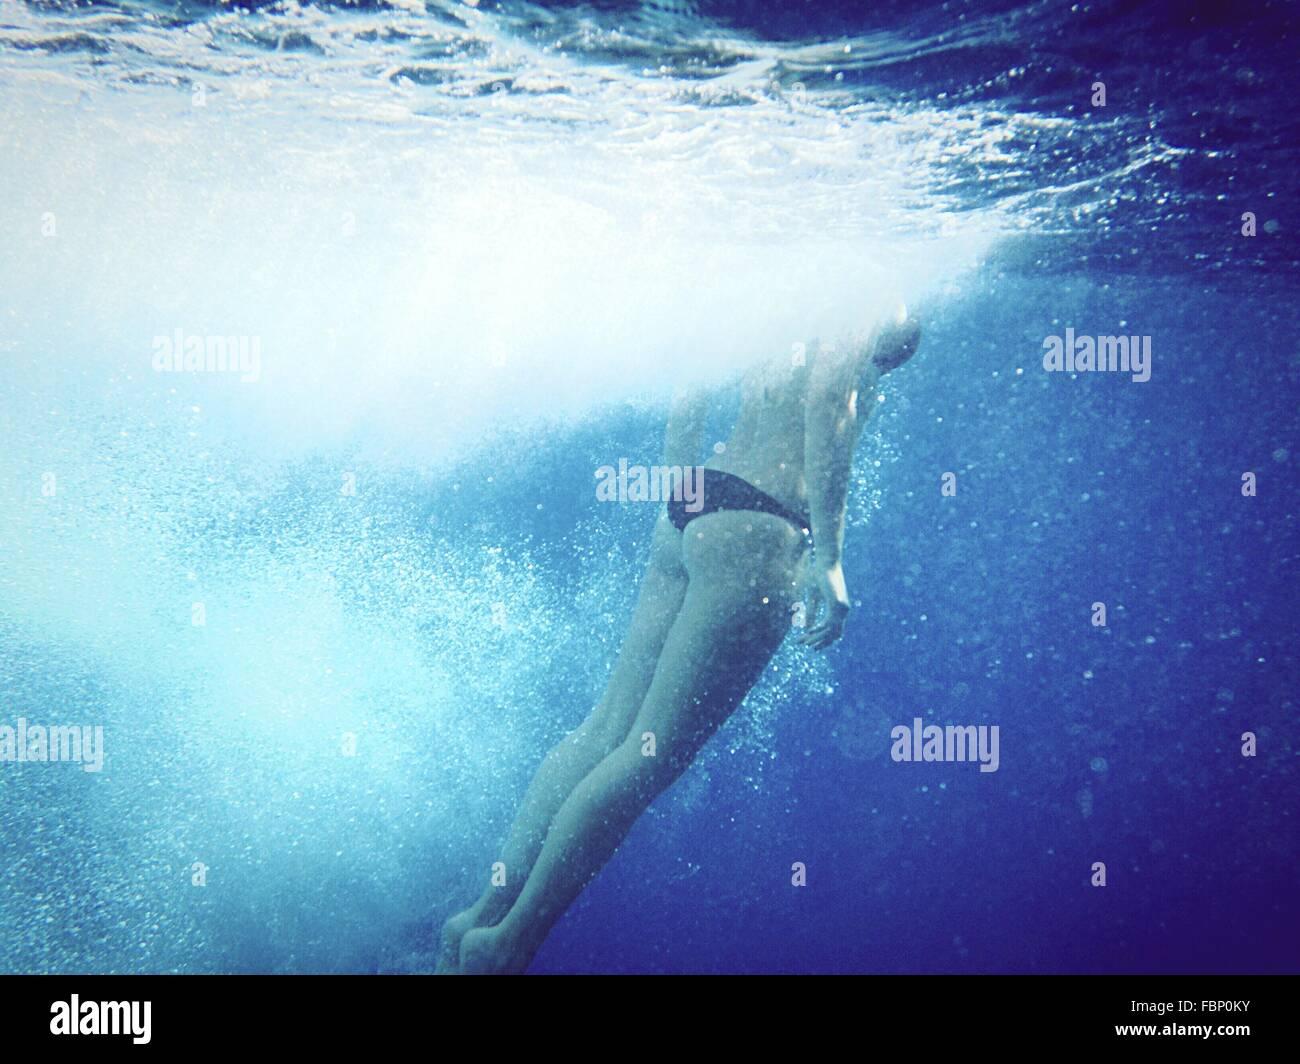 La section basse de Woman Swimming Underwater Photo Stock